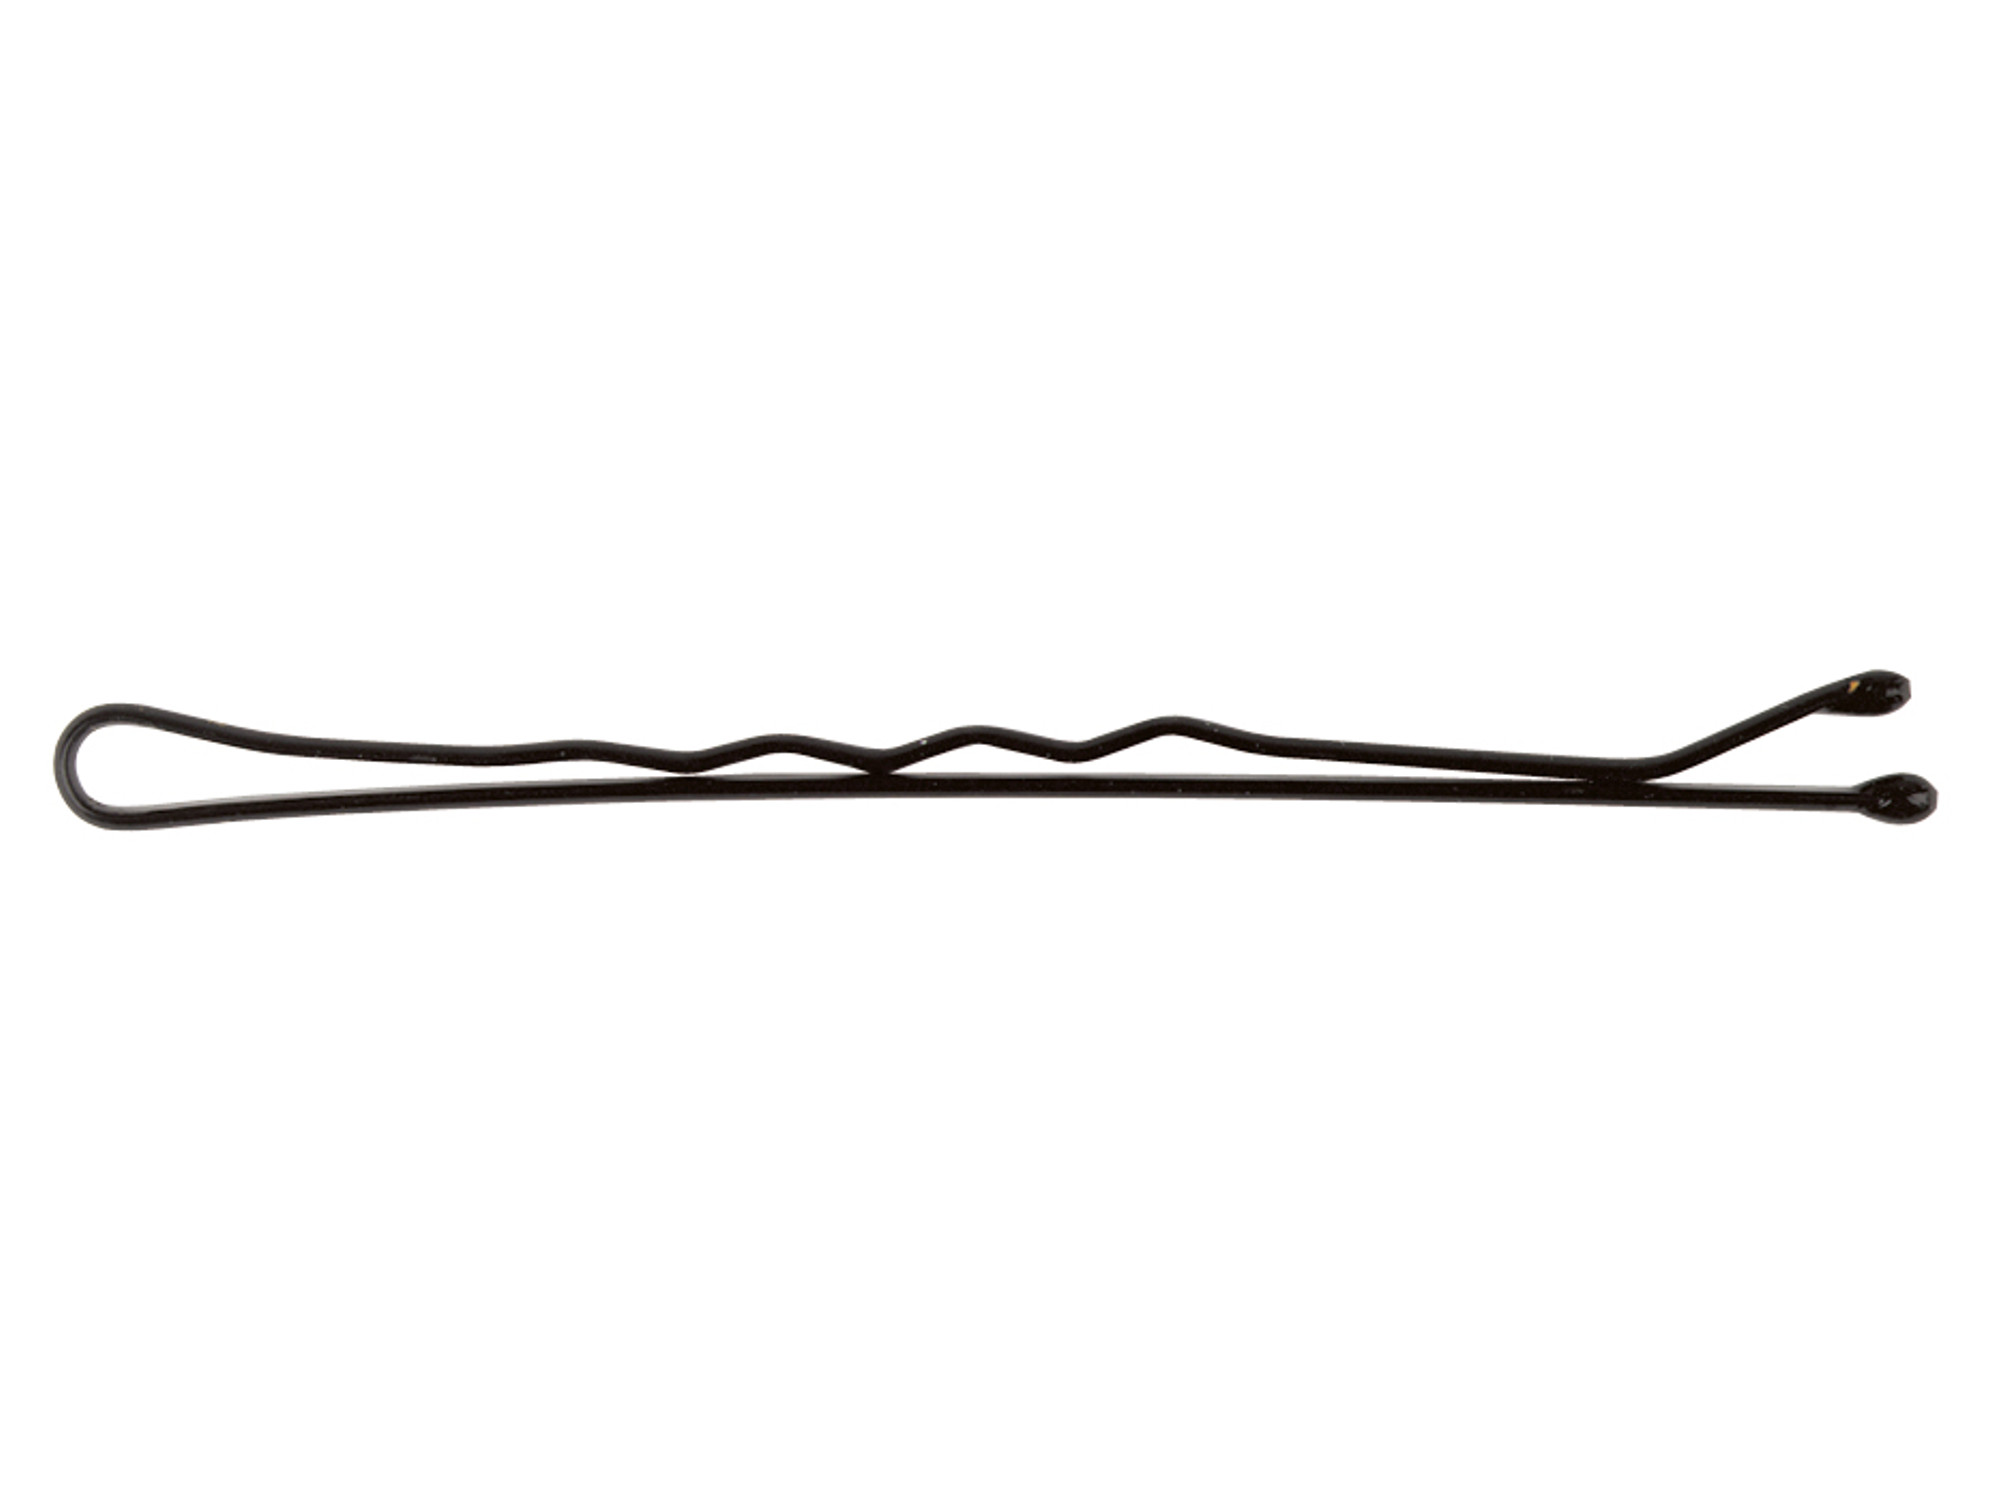 Vlnitá sponka Sibel Wavy - 7 cm, černá - 500 g (9400071-02) + DÁREK ZDARMA